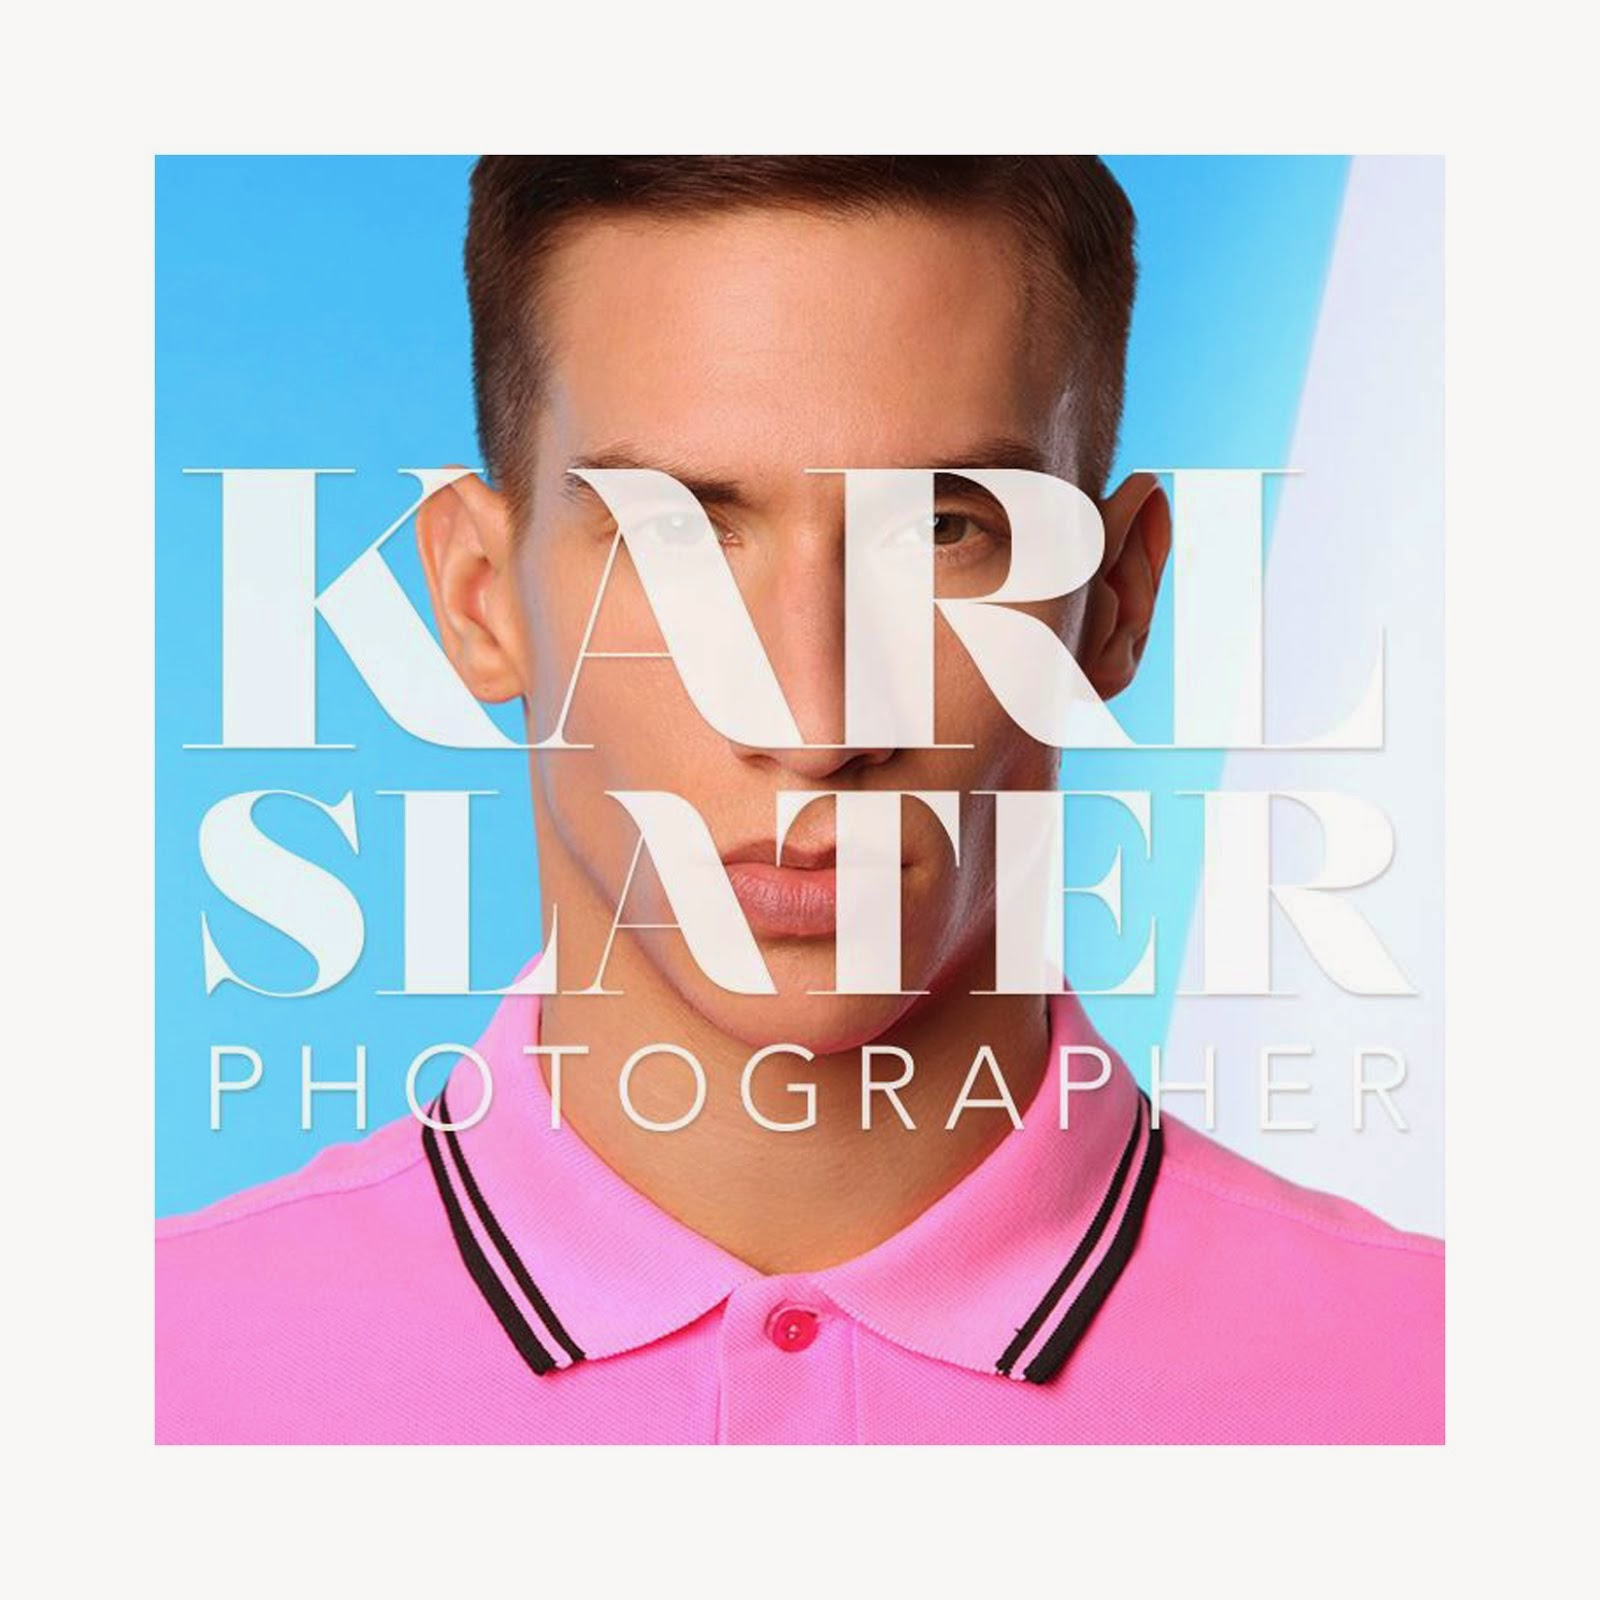 Karl Slater